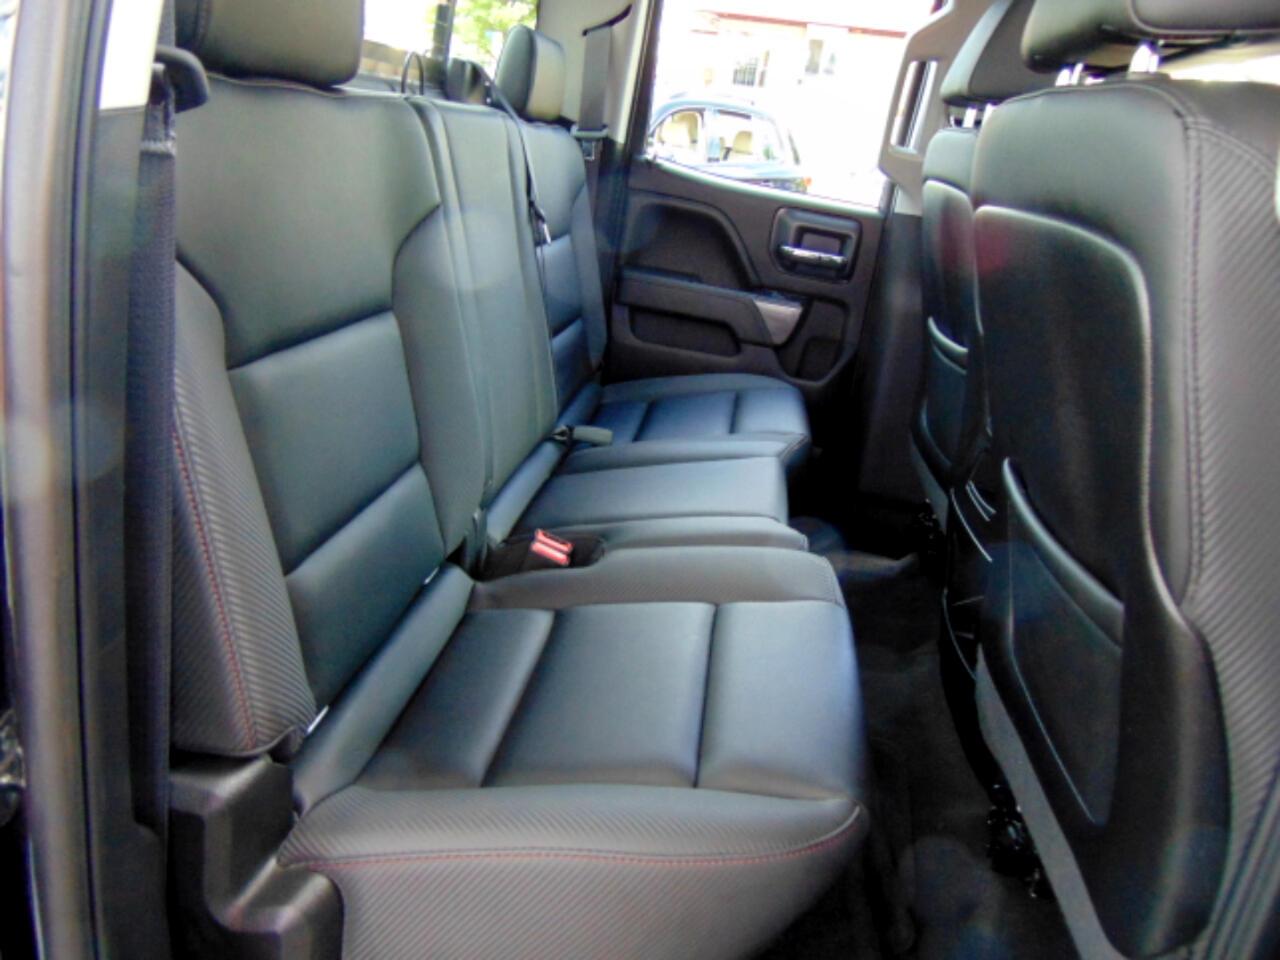 2015 GMC Sierra 1500 SLT Double Cab 4WD